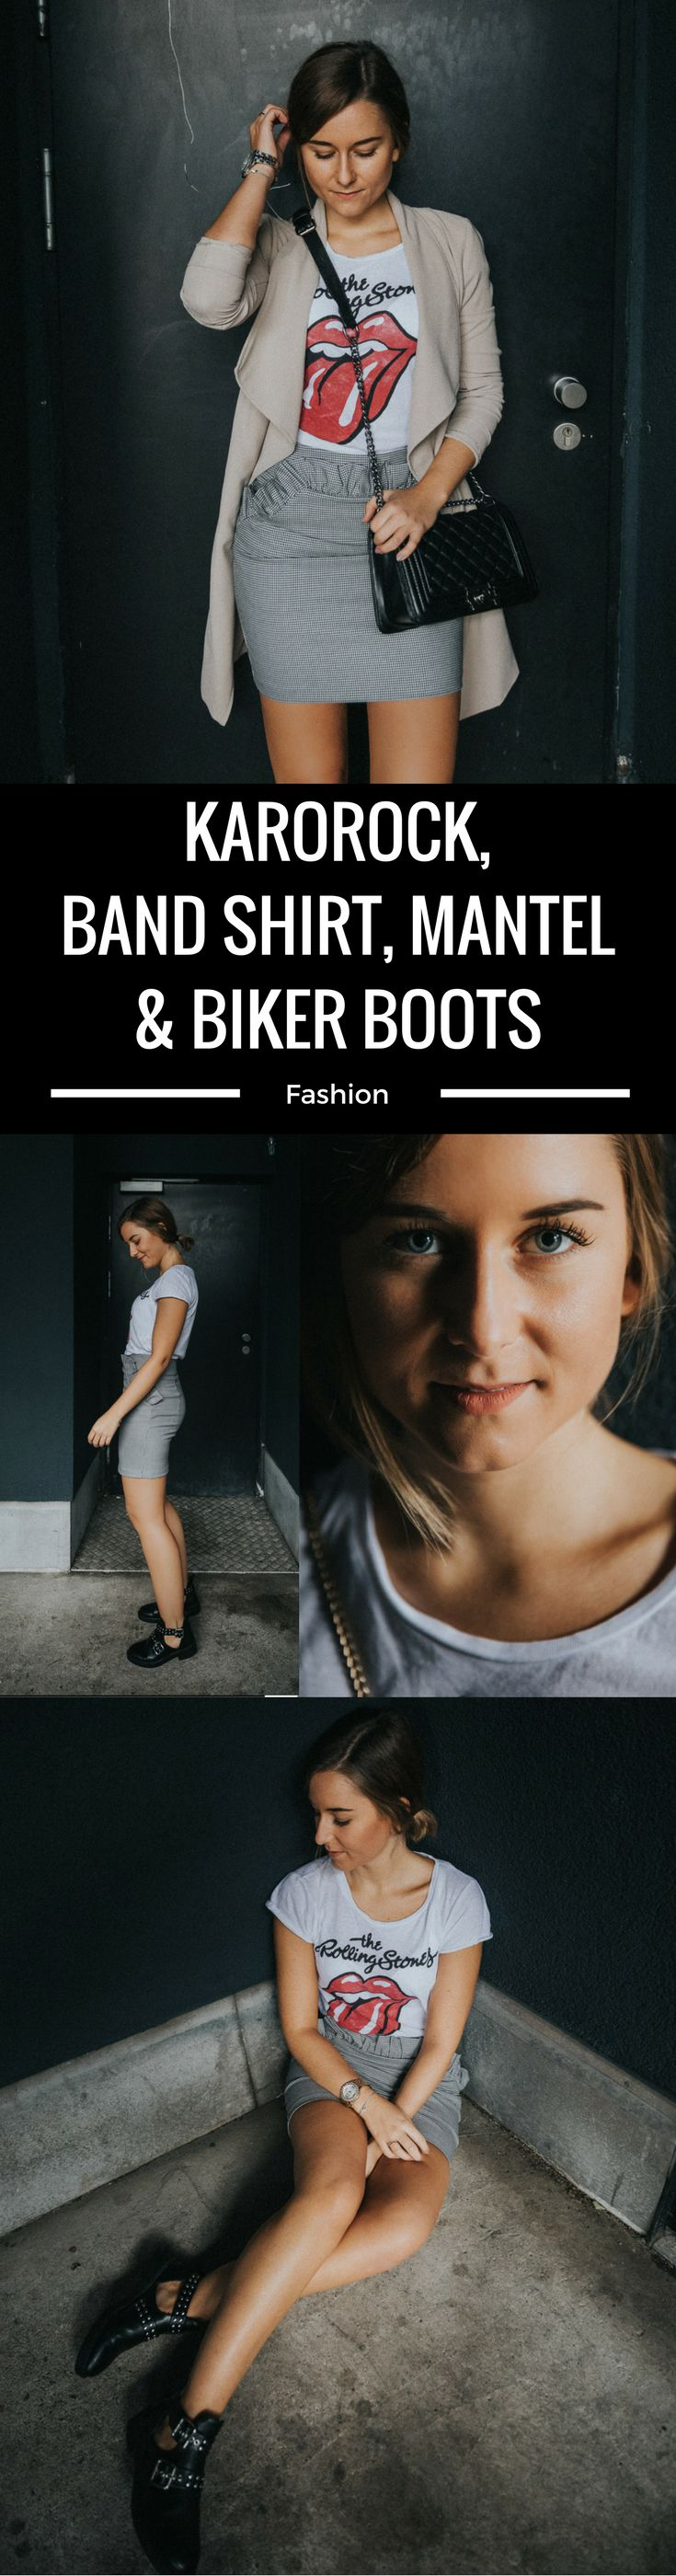 Karorock, Band Shirt, Mantel & Biker Boots kombinieren, schulterfrei, Übergangsschuh, Dress Italien Jesolo, Look, Outfit, Fashion Blog, Modeblog, Outfit Blog, Streetstyle, Outfit Blog, Modeblog, Fashion Blog, Fashion Blogger